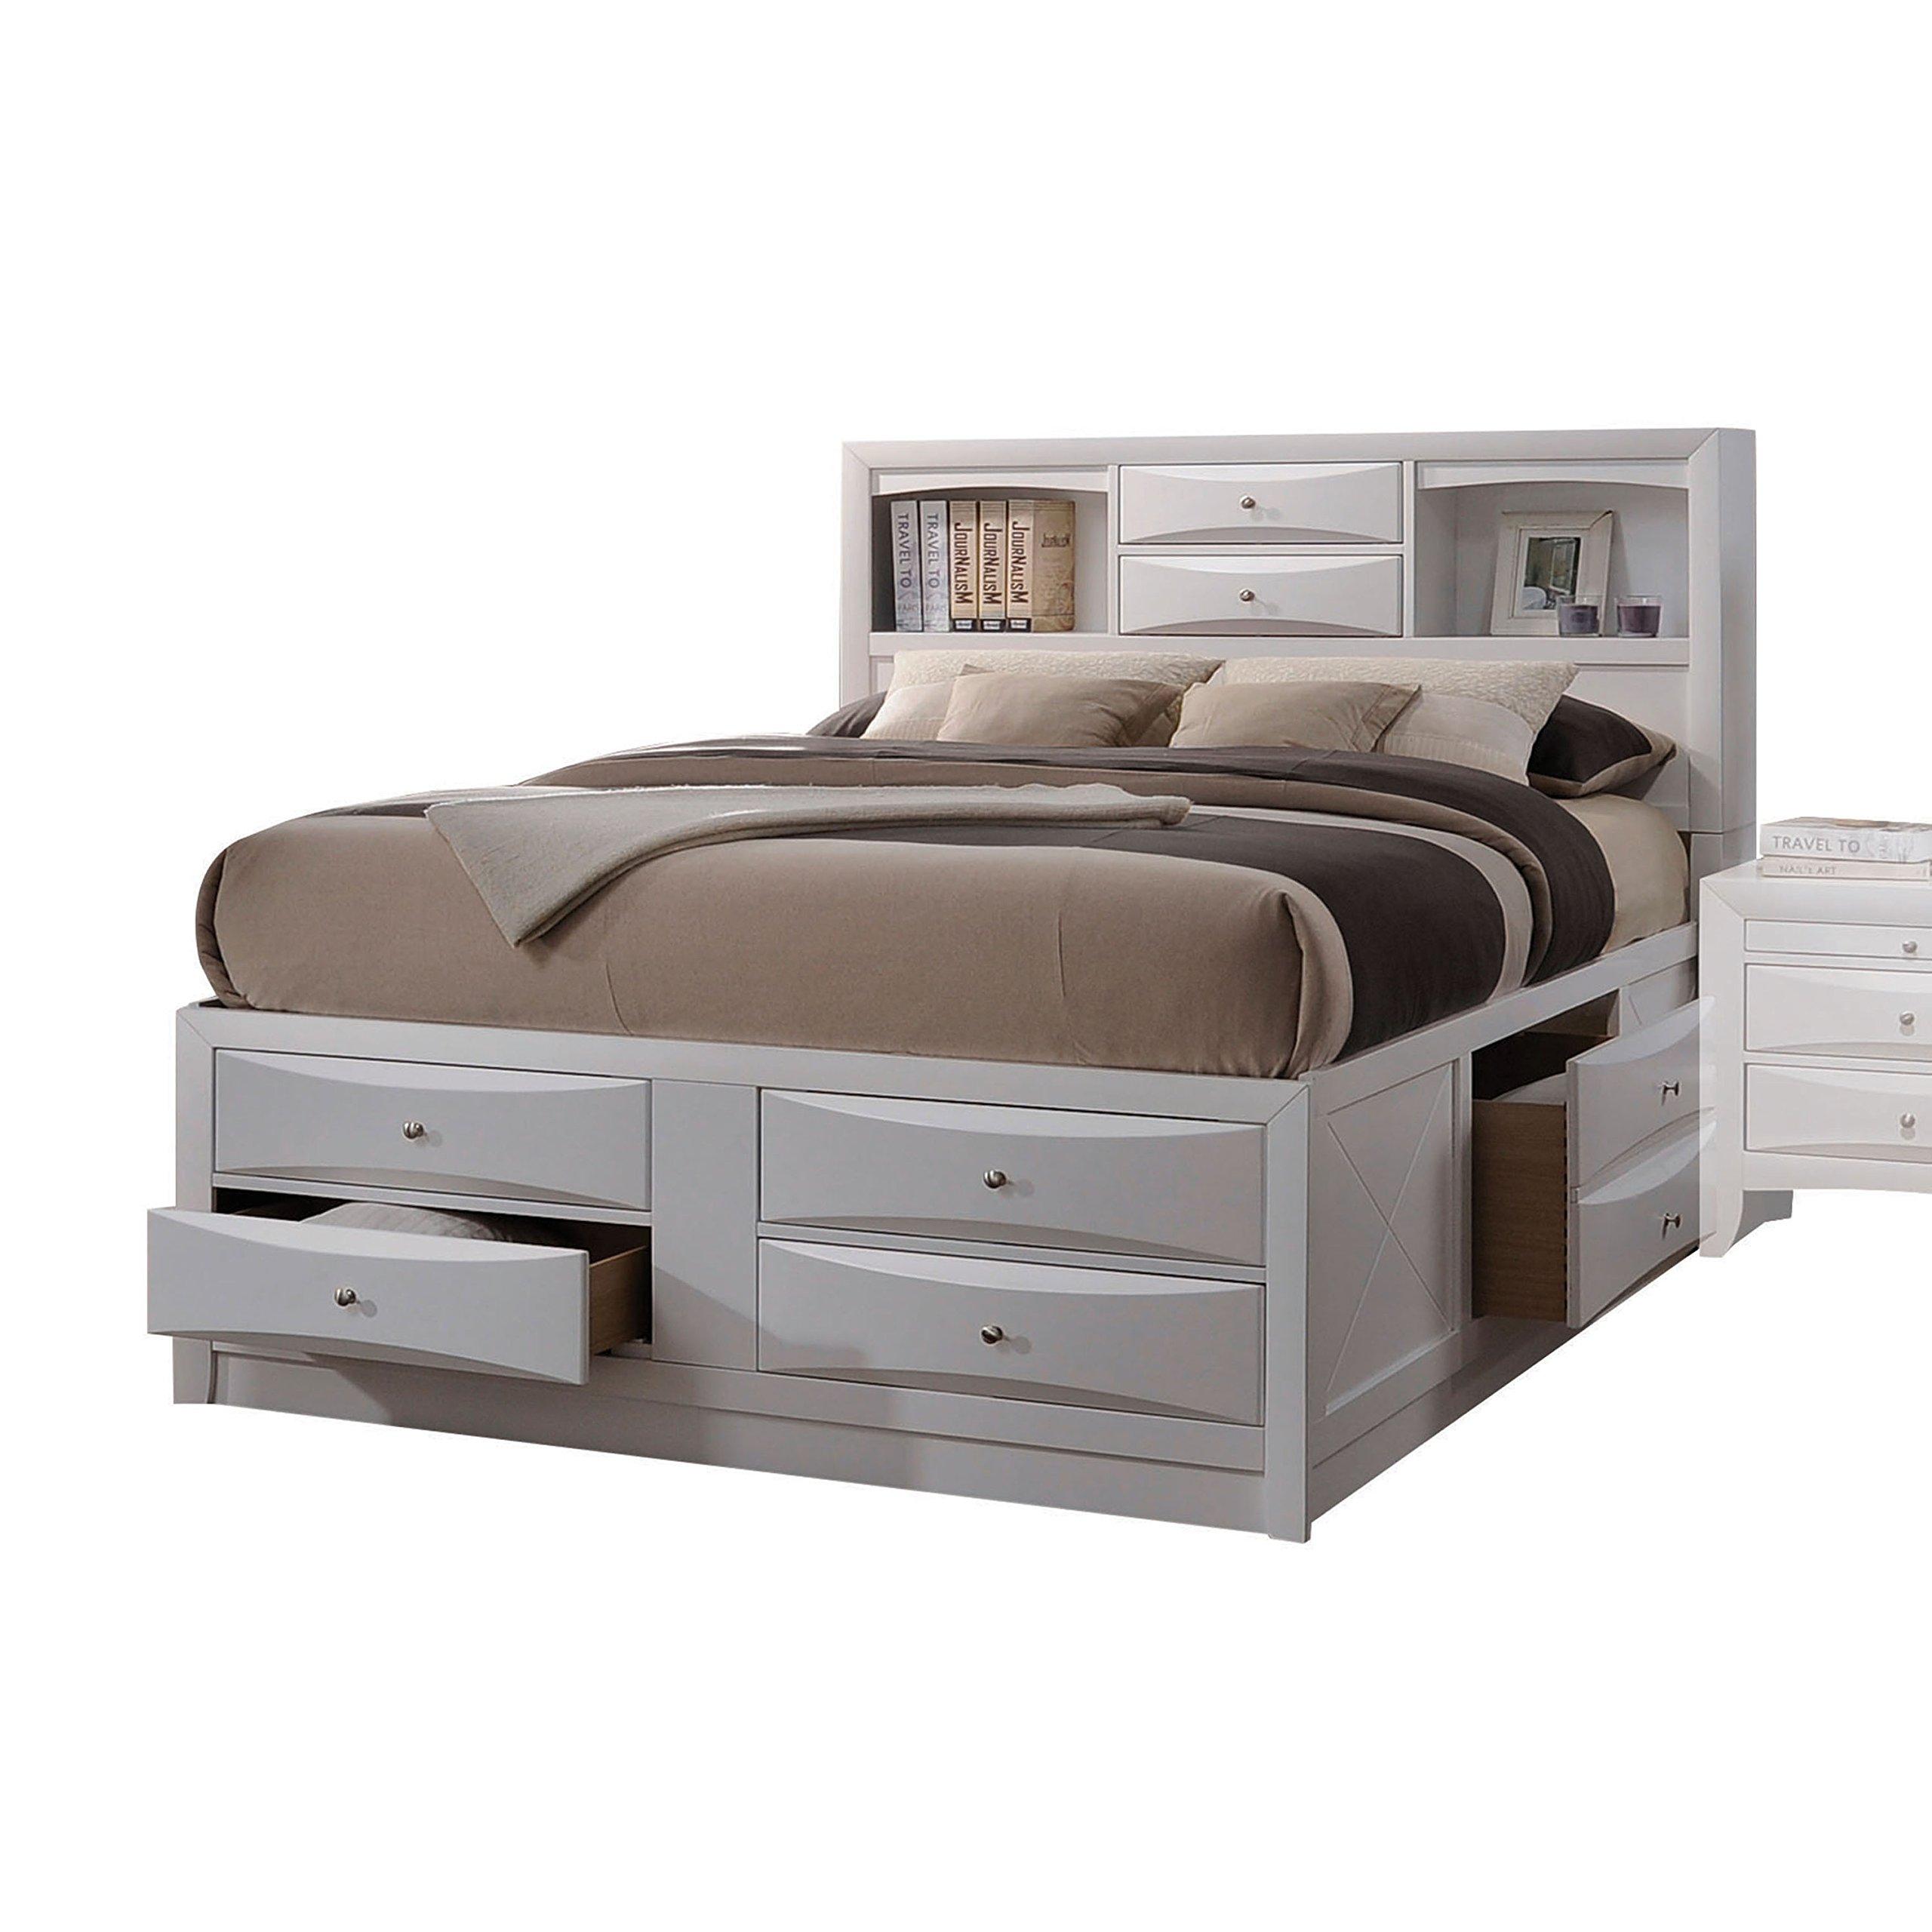 Acme Furniture Ireland 21696EK Eastern King Bed with Storage, White